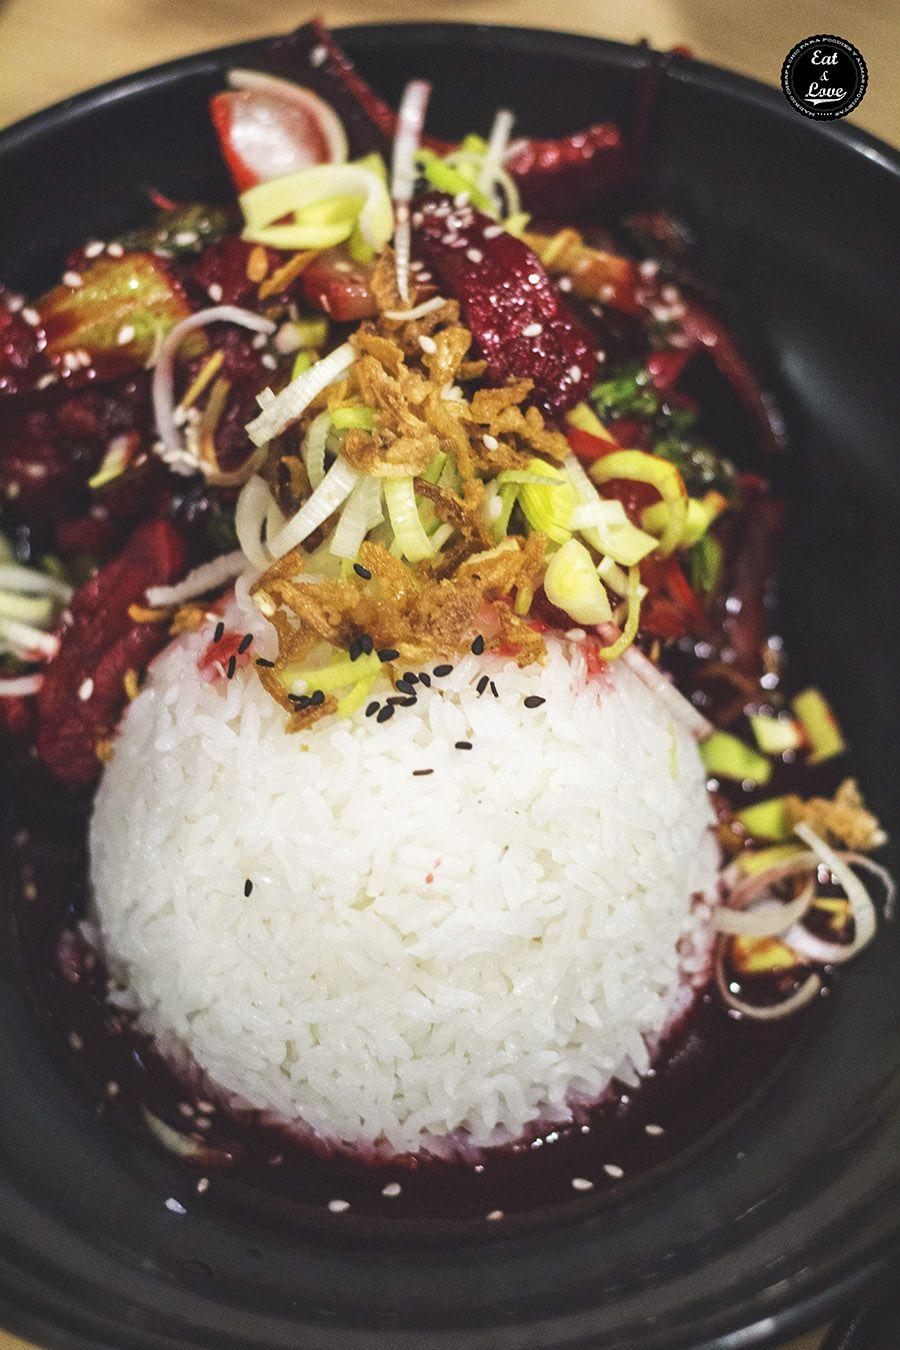 Hong Kong char sui - Tuk tuk street food restaurante asiático Madrid